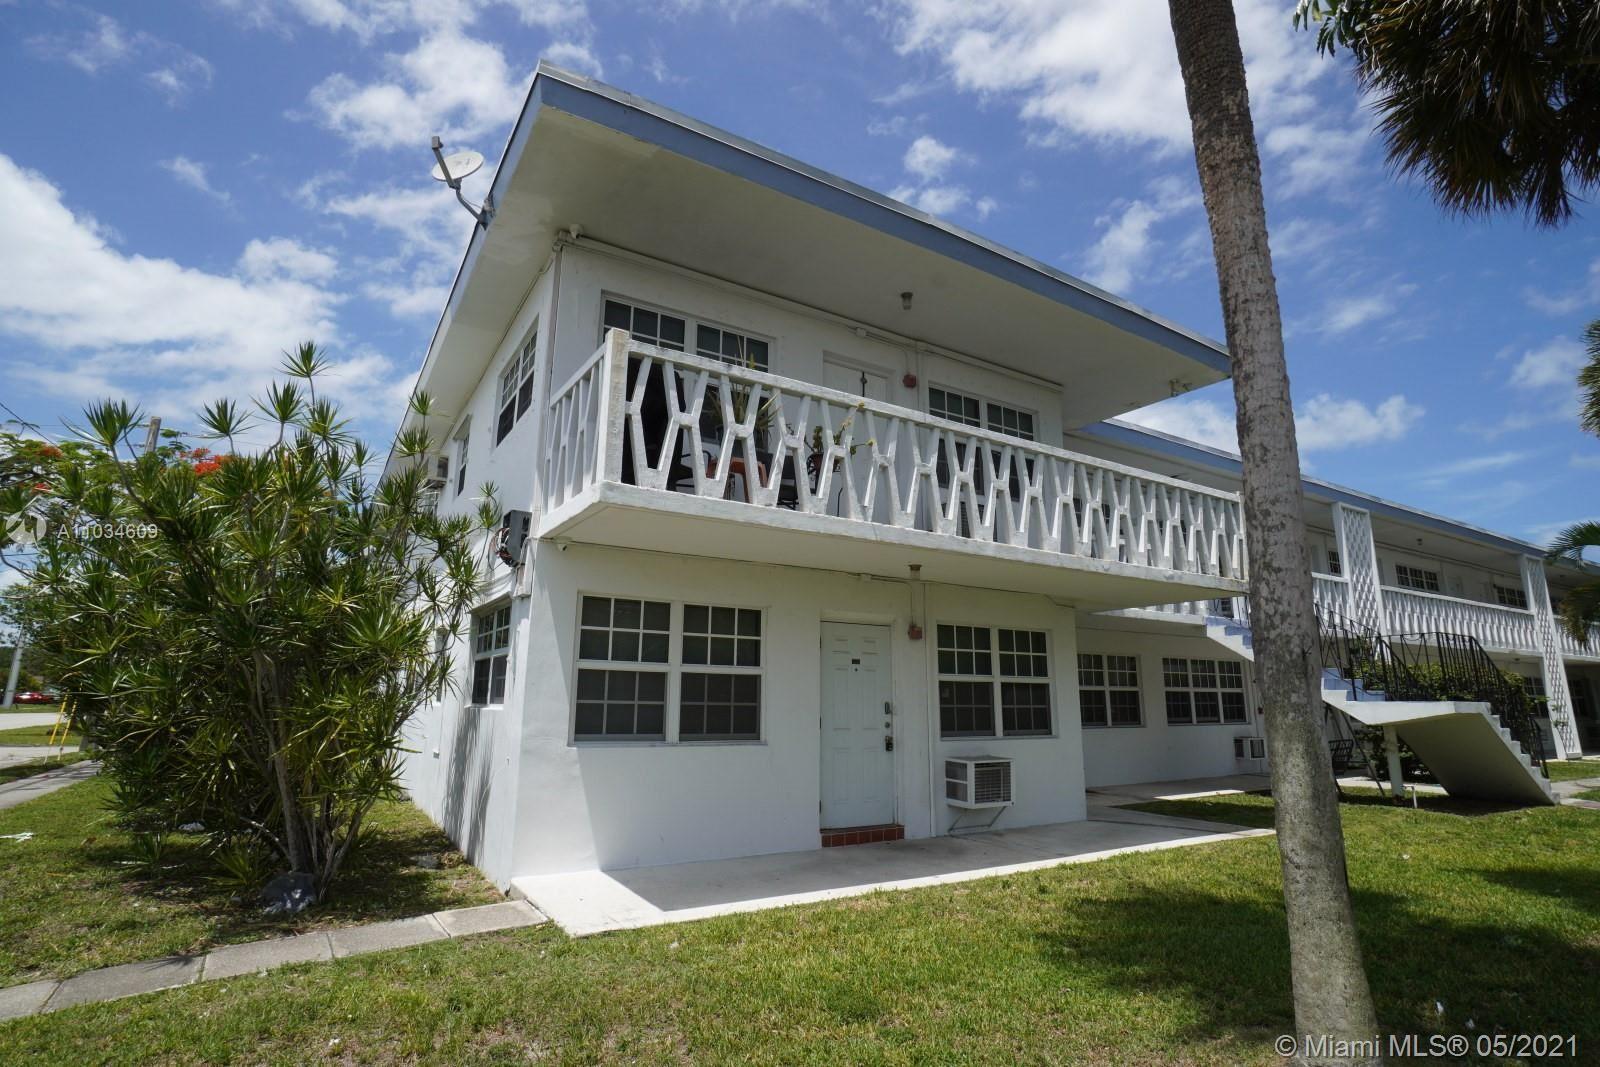 1451 NE 170th St #101A, North Miami Beach, FL 33162 - #: A11034609